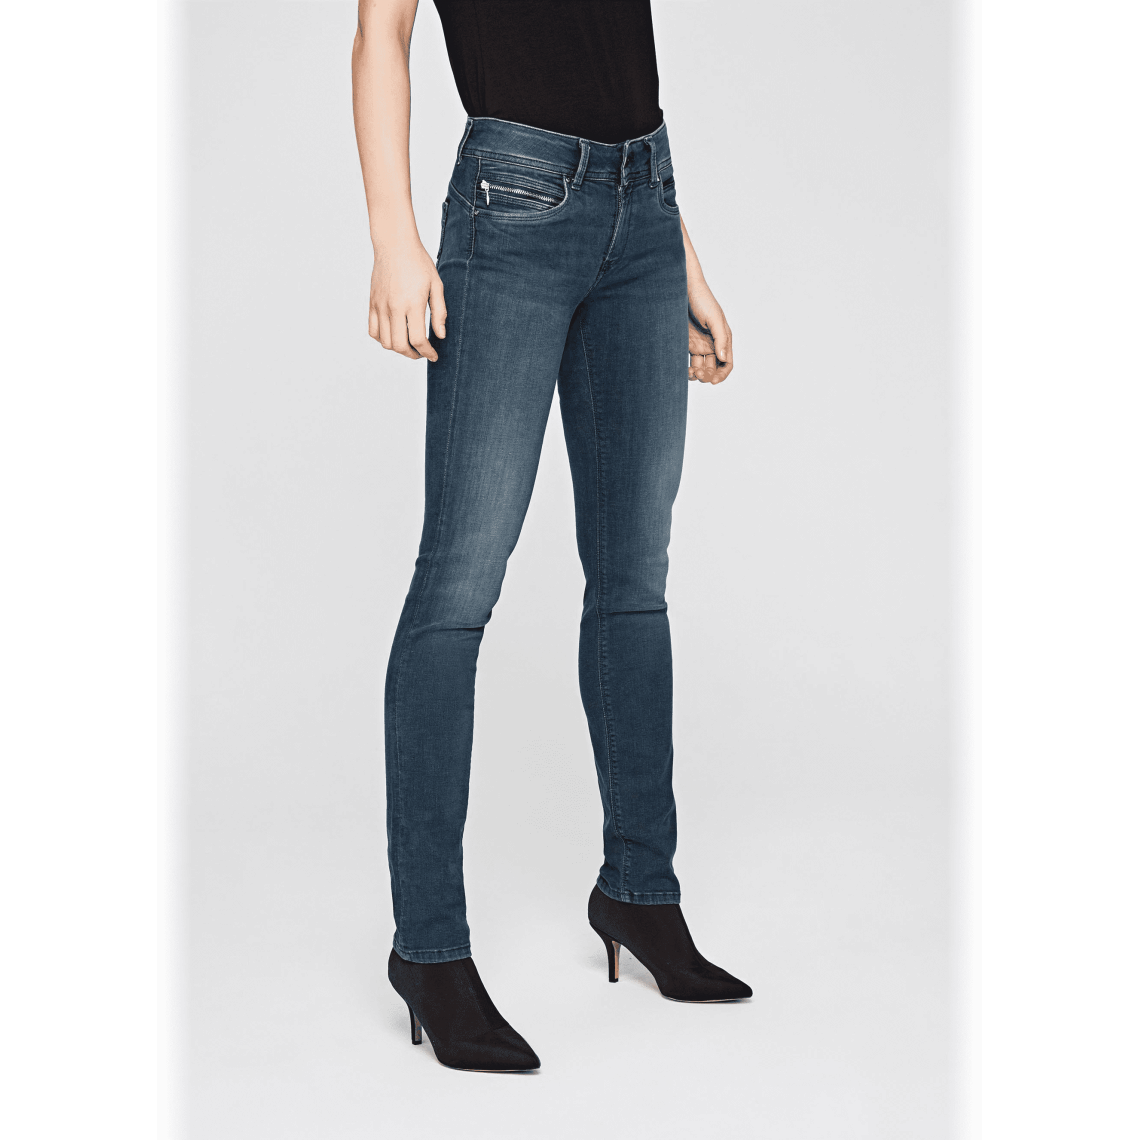 Jeans 3suisses Pepe Femme 3suisses 3suisses Pepe Jeans Femme Pepe Jeans Femme 0wPkX8nO